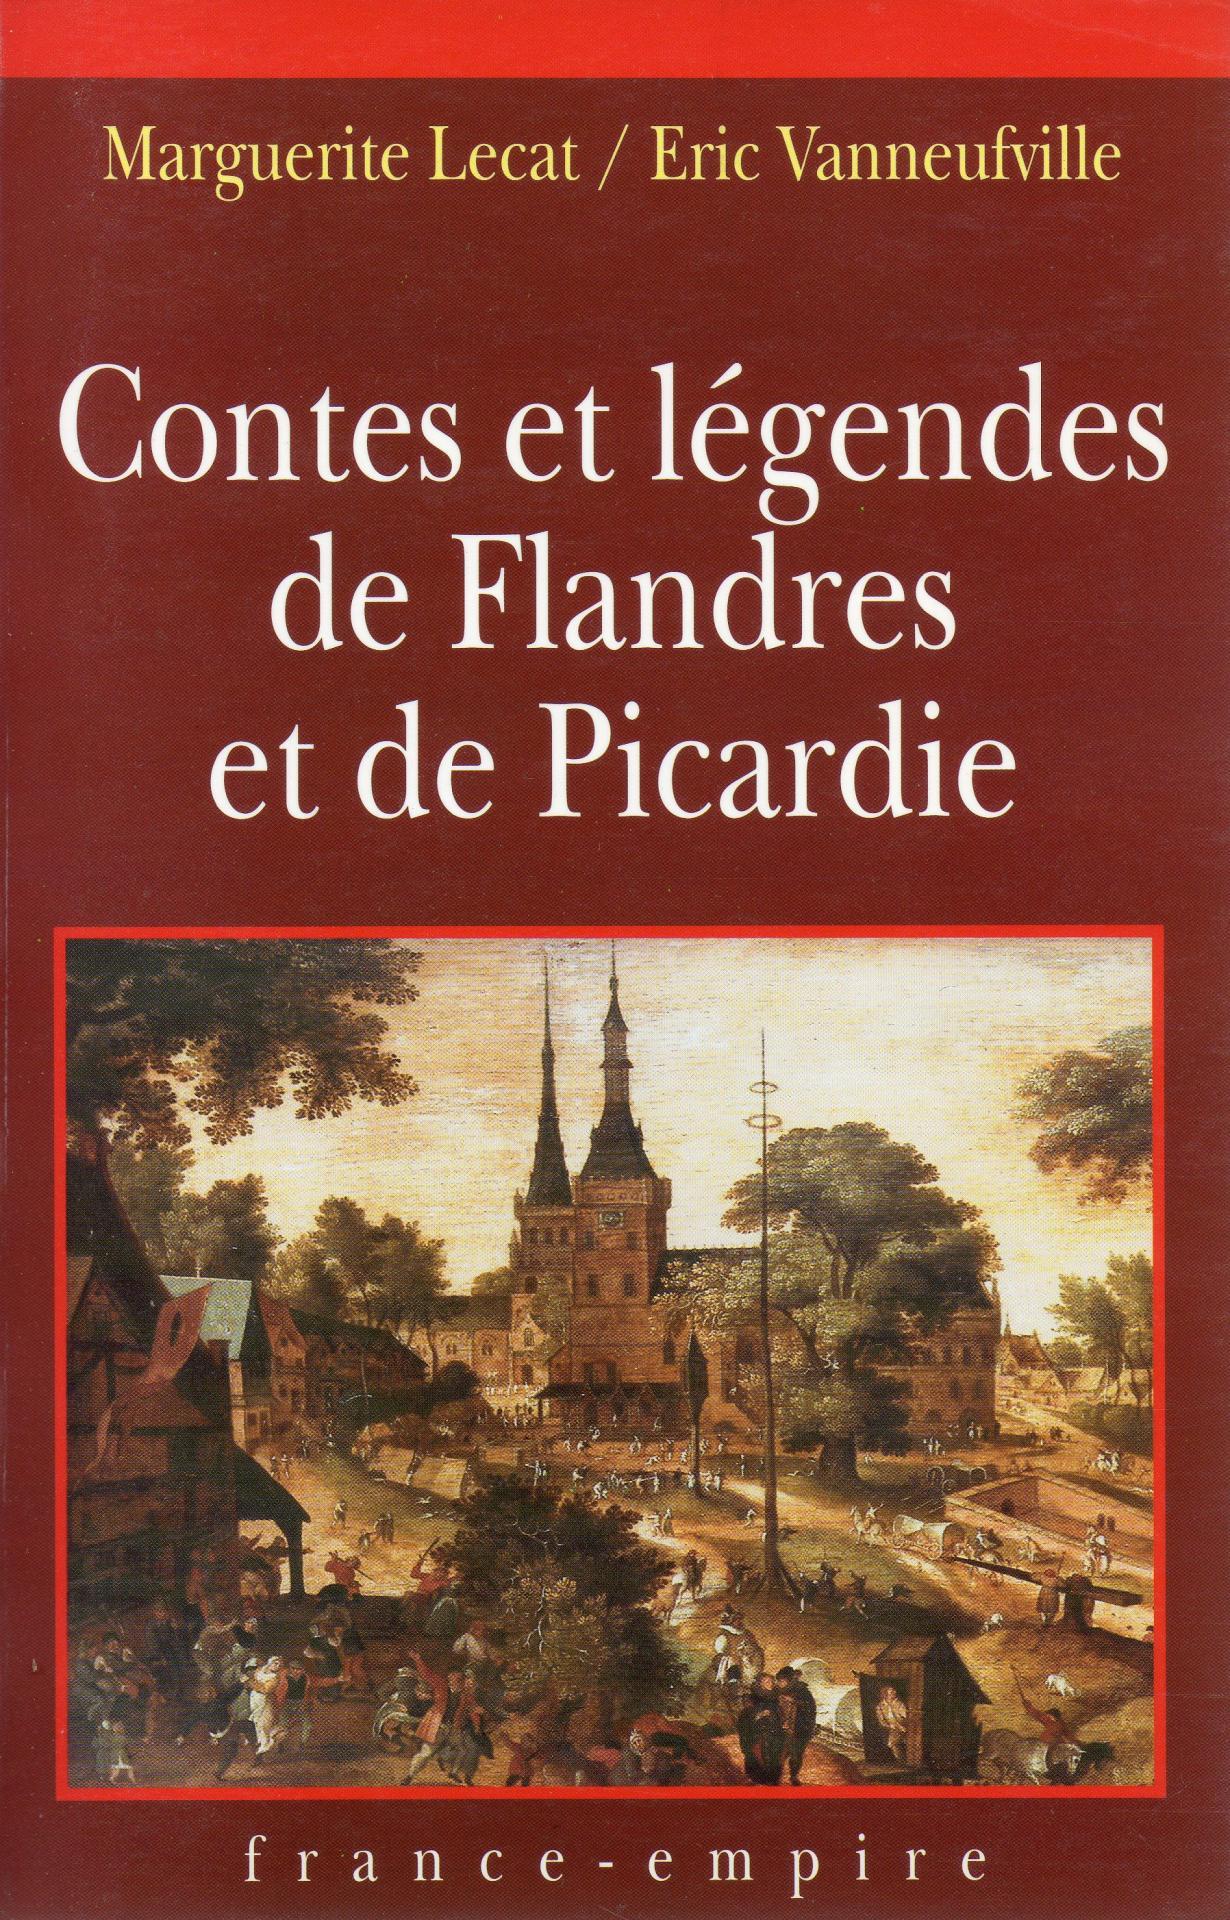 Contes flandres picardie